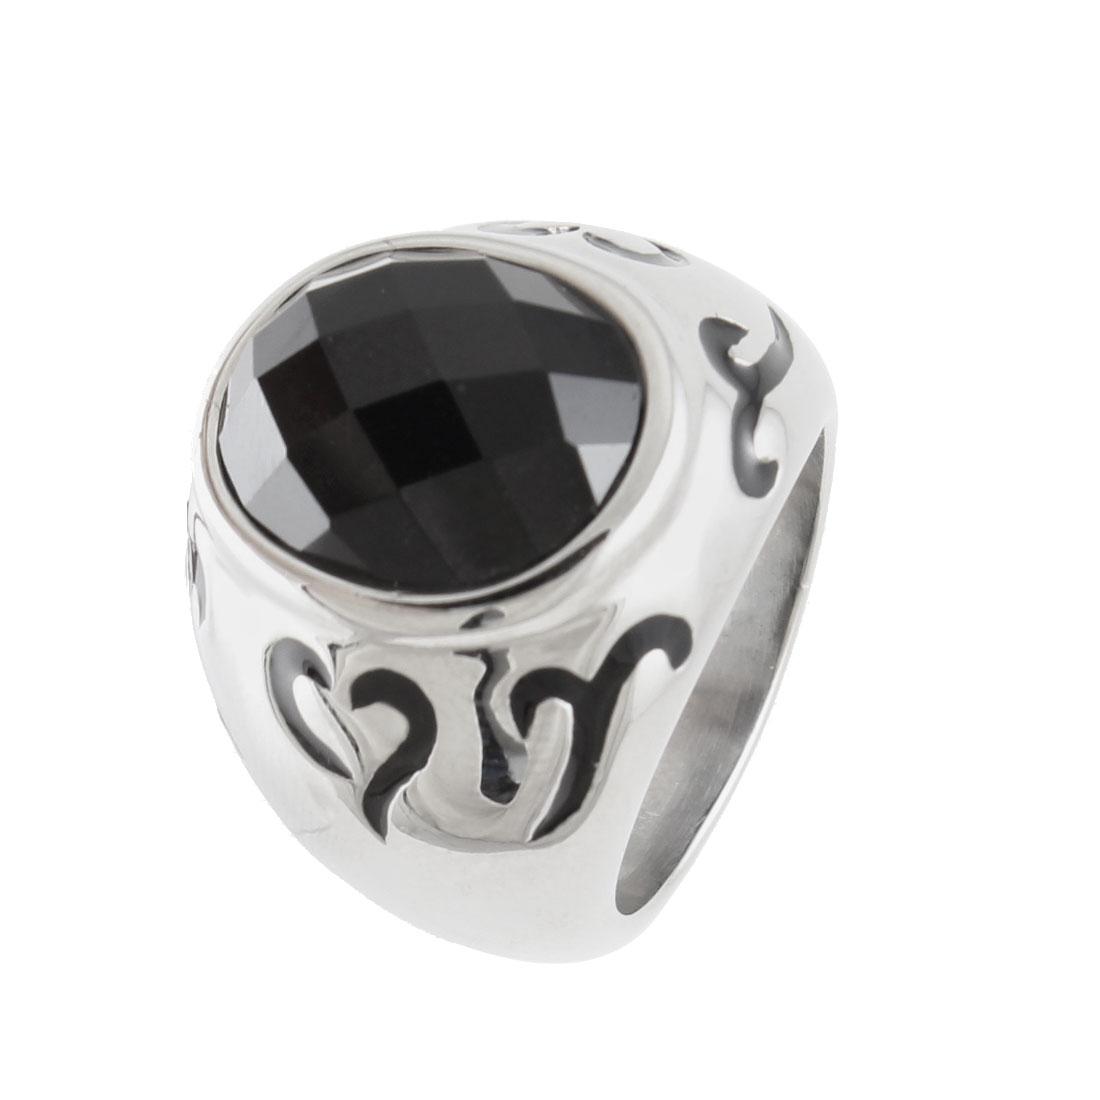 US 9 Finger Decor Black Plastic Faceted Crystal Ring for Man